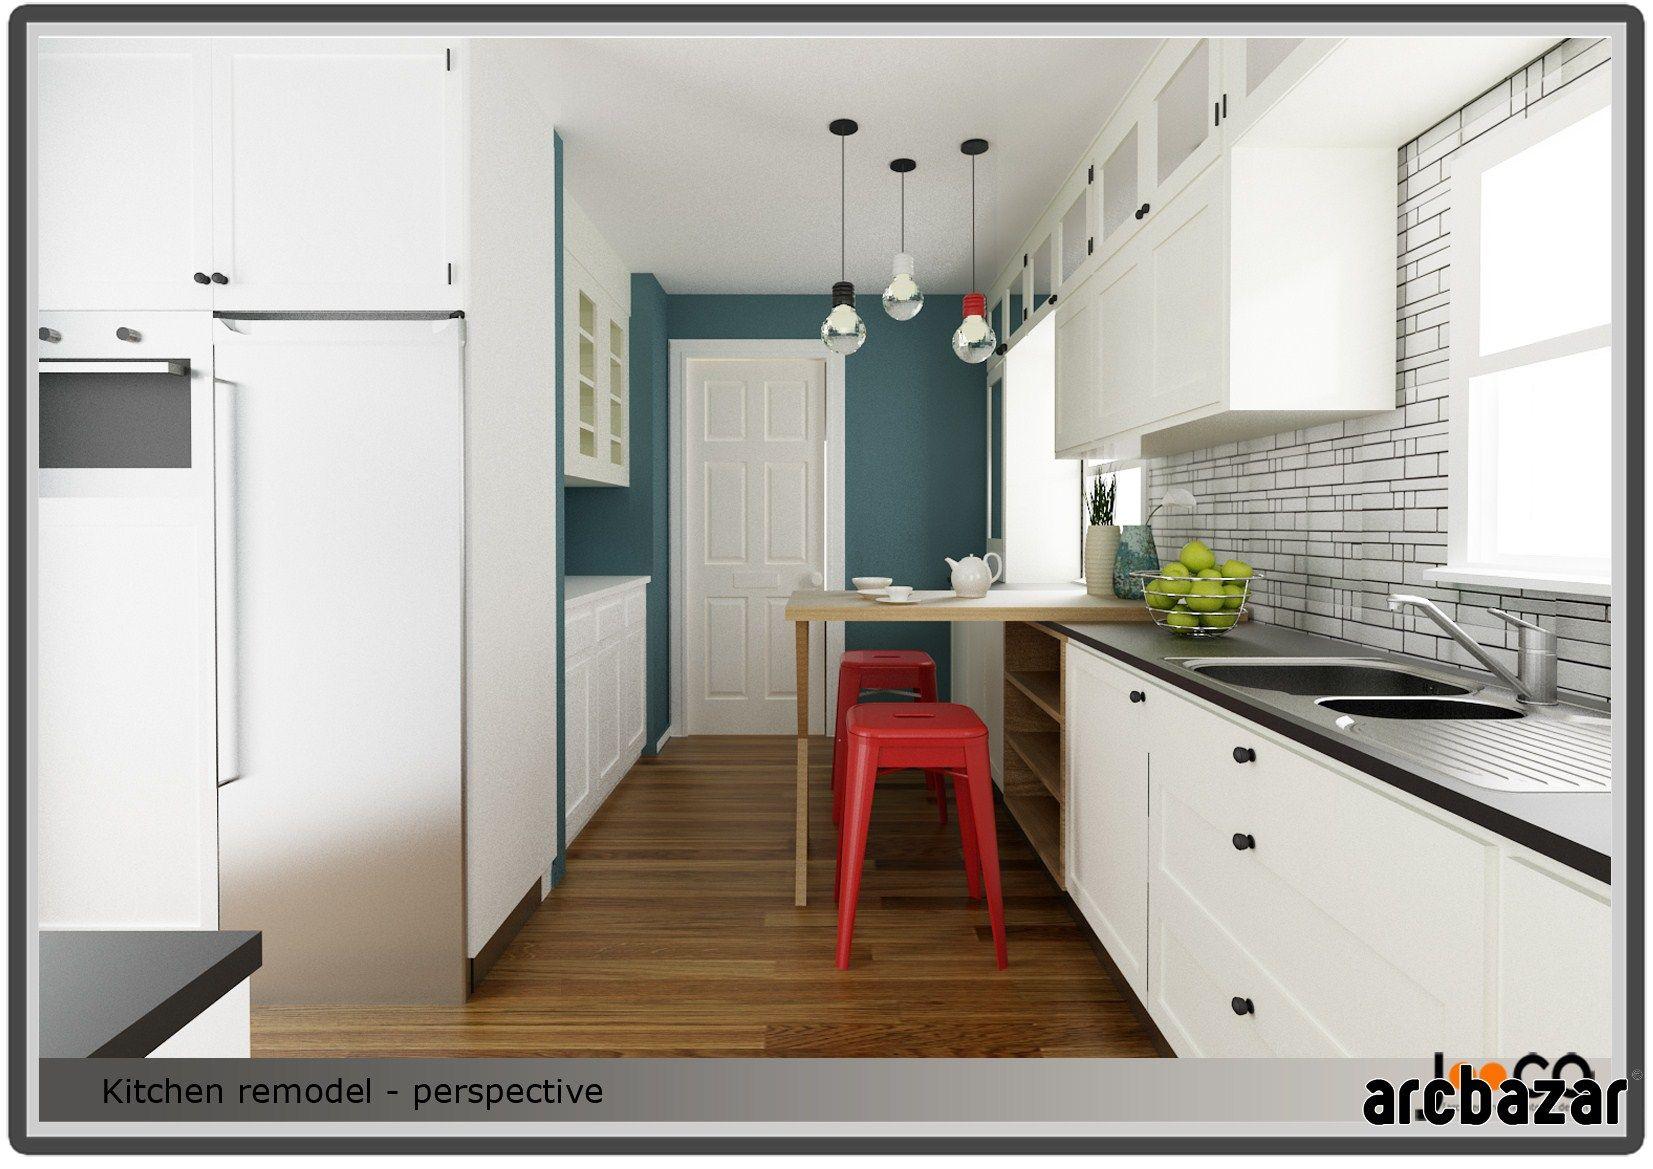 Kitchen Remodel Design By Jooca Studio Via Arcbazar.com · Kansas  CityKitchen Remodel